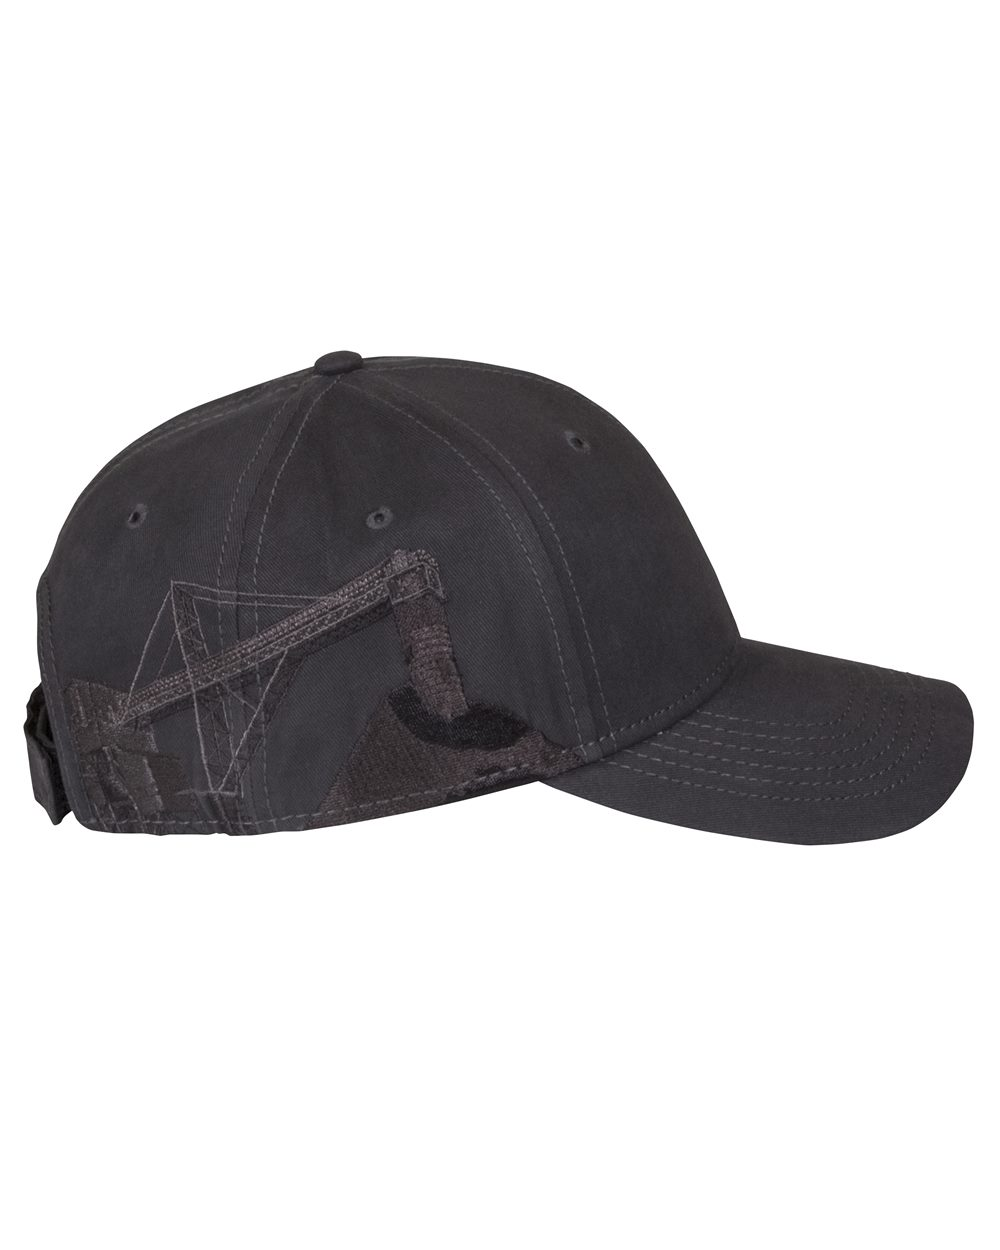 DRI DUCK 3349 - Mining Cap